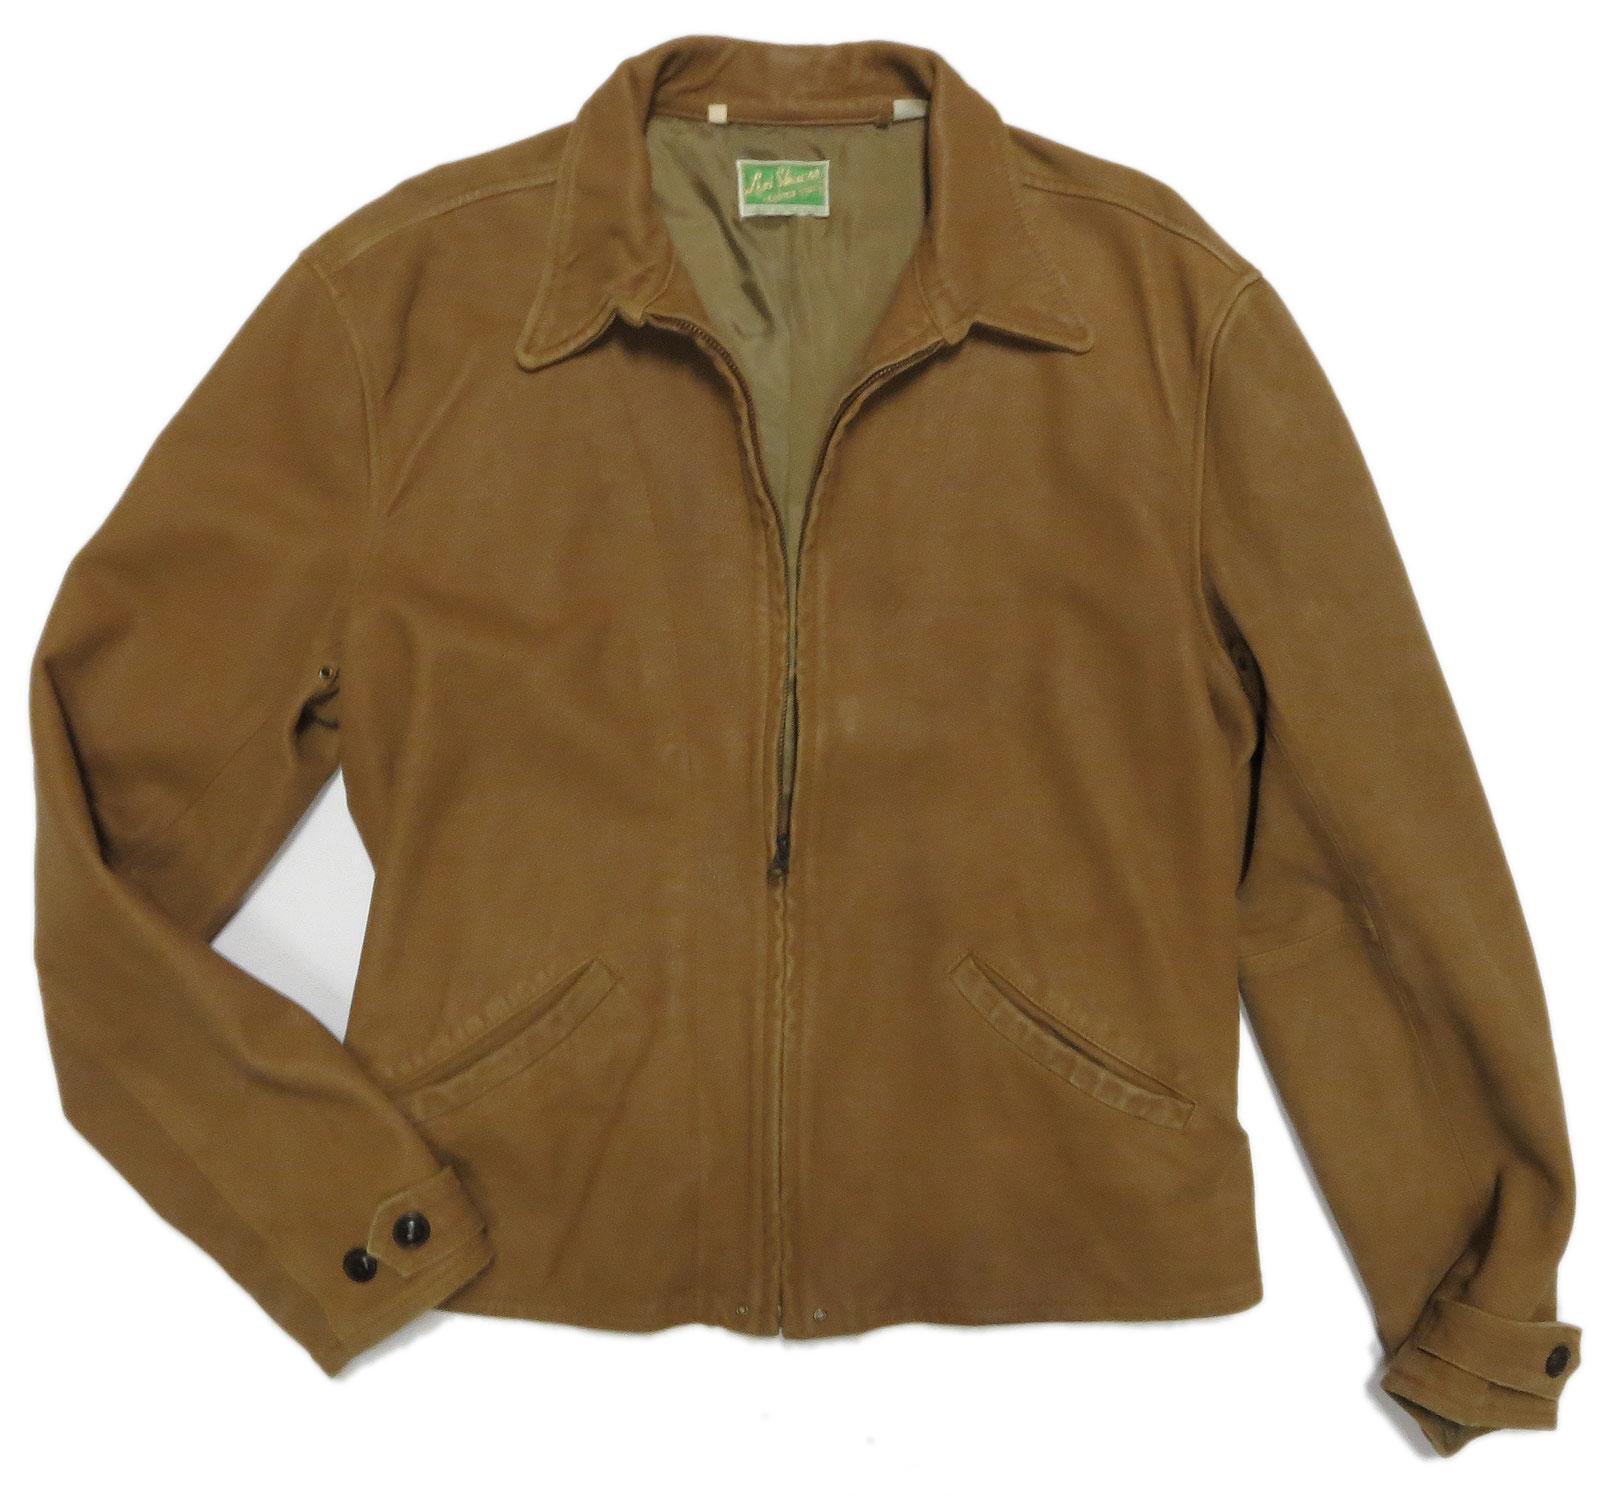 Levi's Vintage Suede Jacket